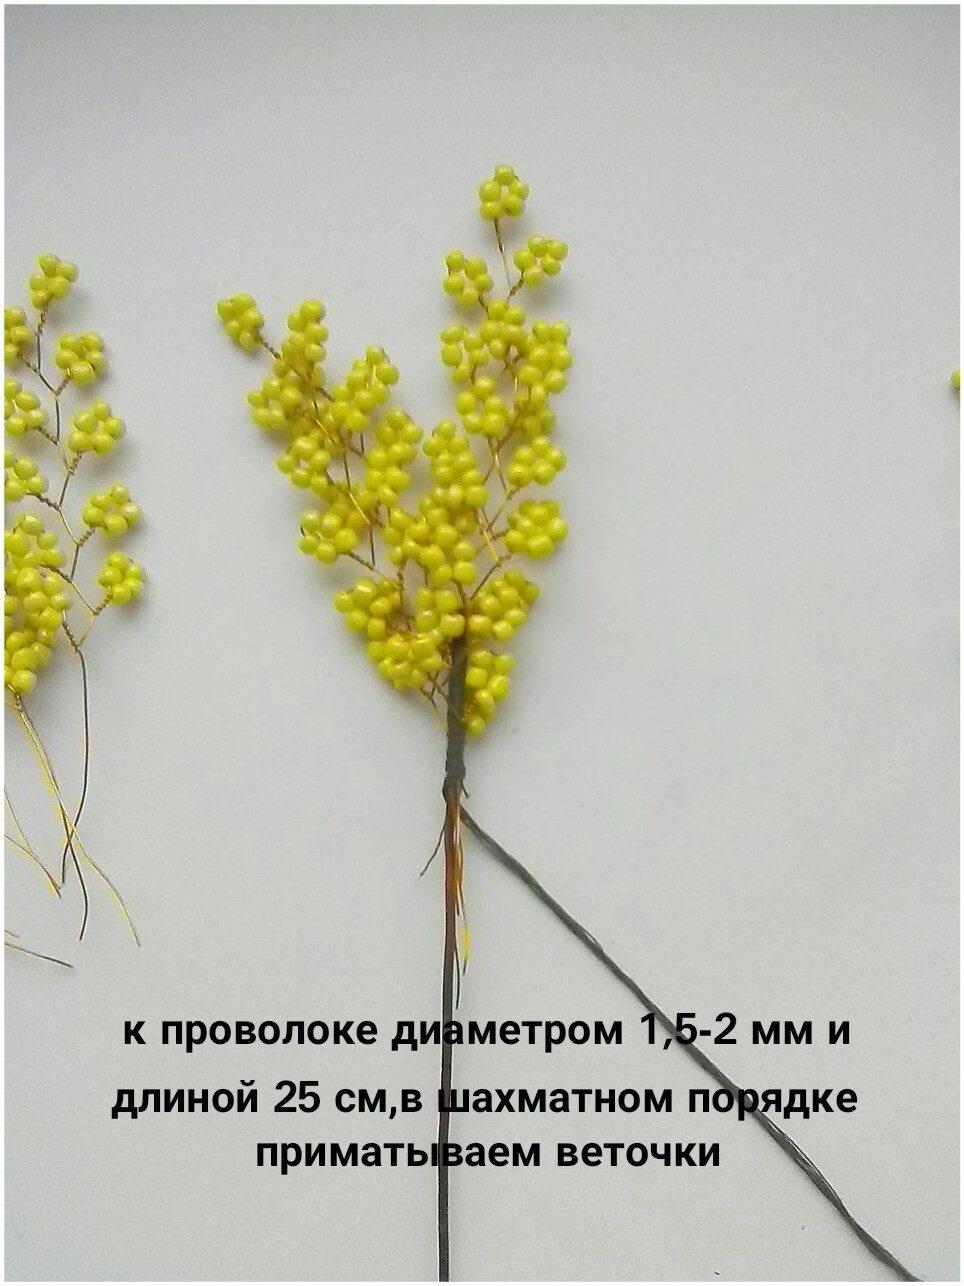 Композиции Image?id=851200740548&t=3&plc=WEB&tkn=*LyShxiUl0k3YuVOgvAwQpyfm0dU